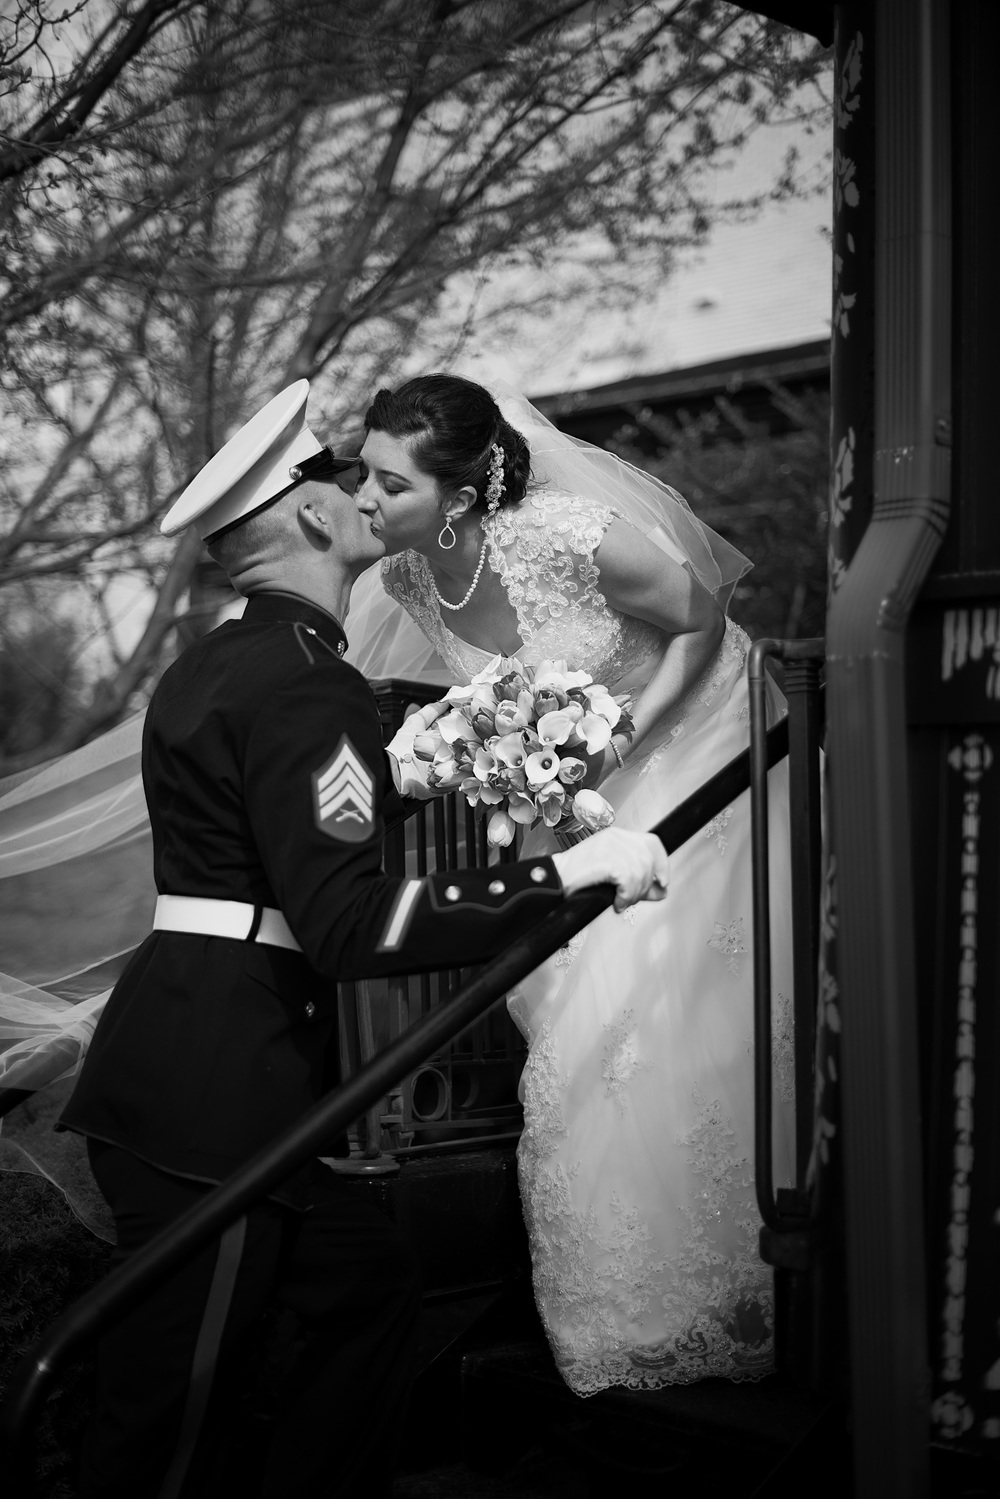 groom bride kiss train bw portrait THPHOTO